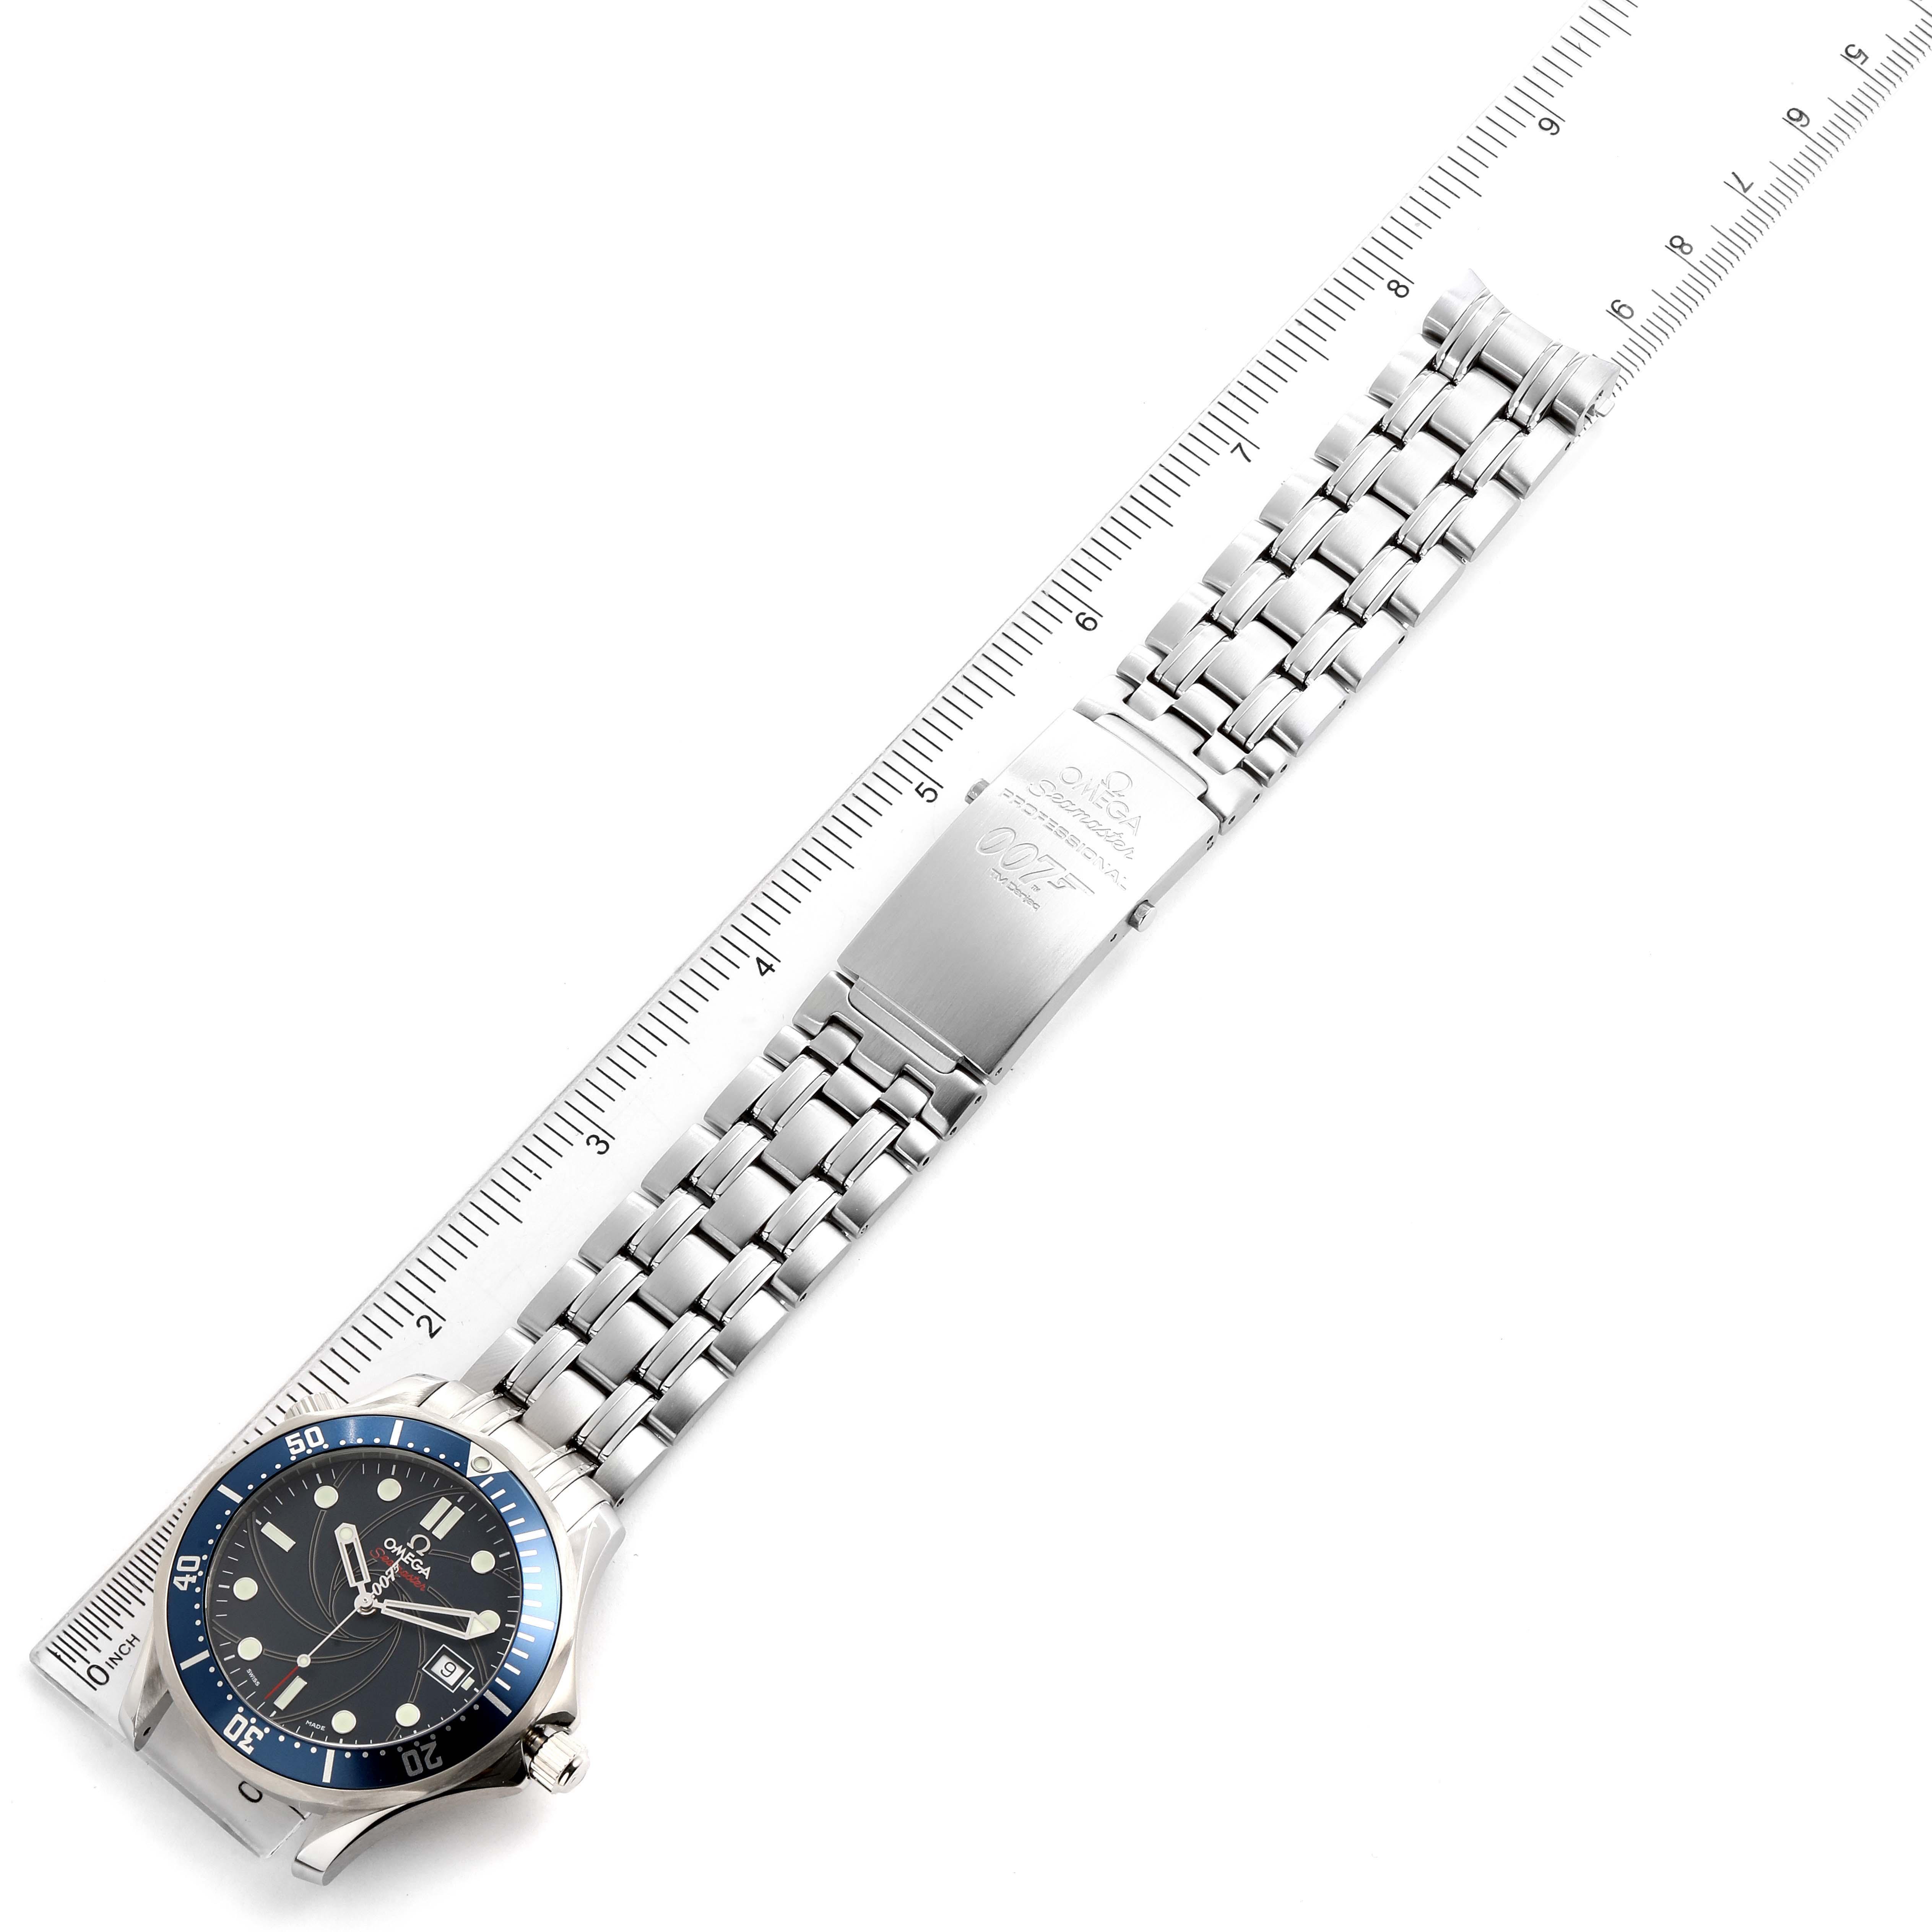 Omega Seamaster Bond 007 Limited Edition Mens Watch 2226.80.00 SwissWatchExpo